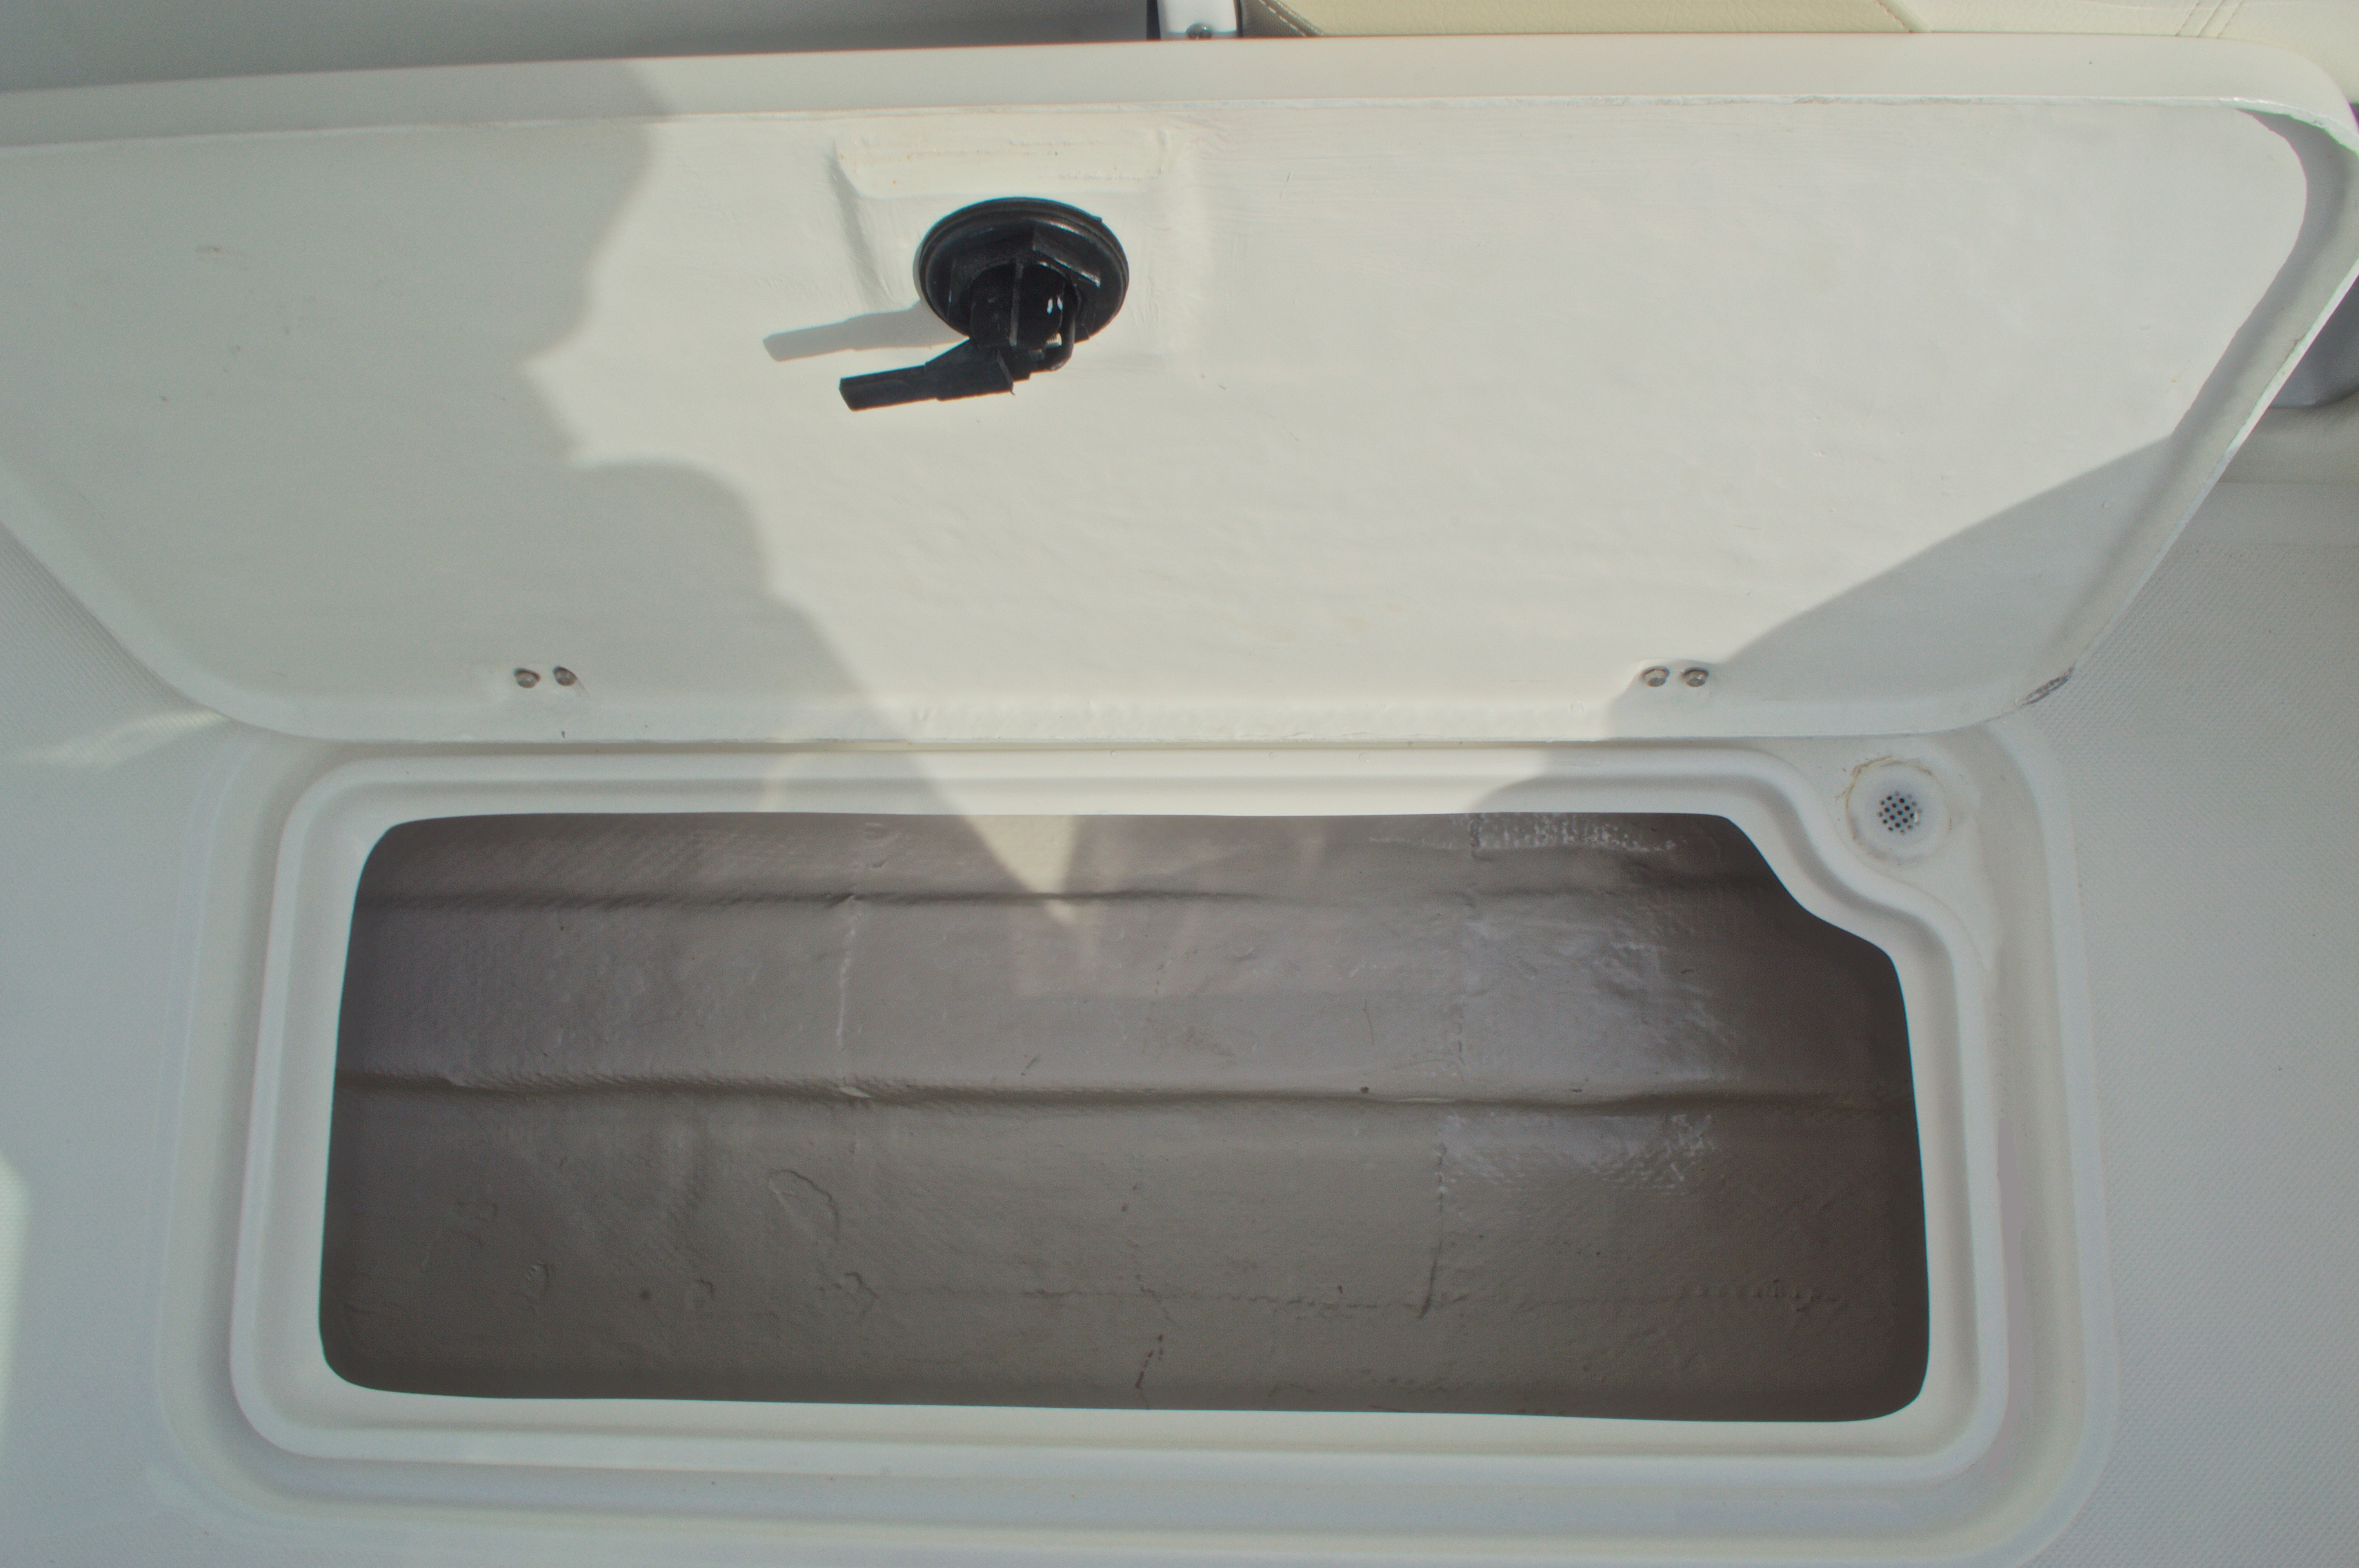 Thumbnail 28 for New 2016 Hurricane CC21 Center Console boat for sale in Vero Beach, FL